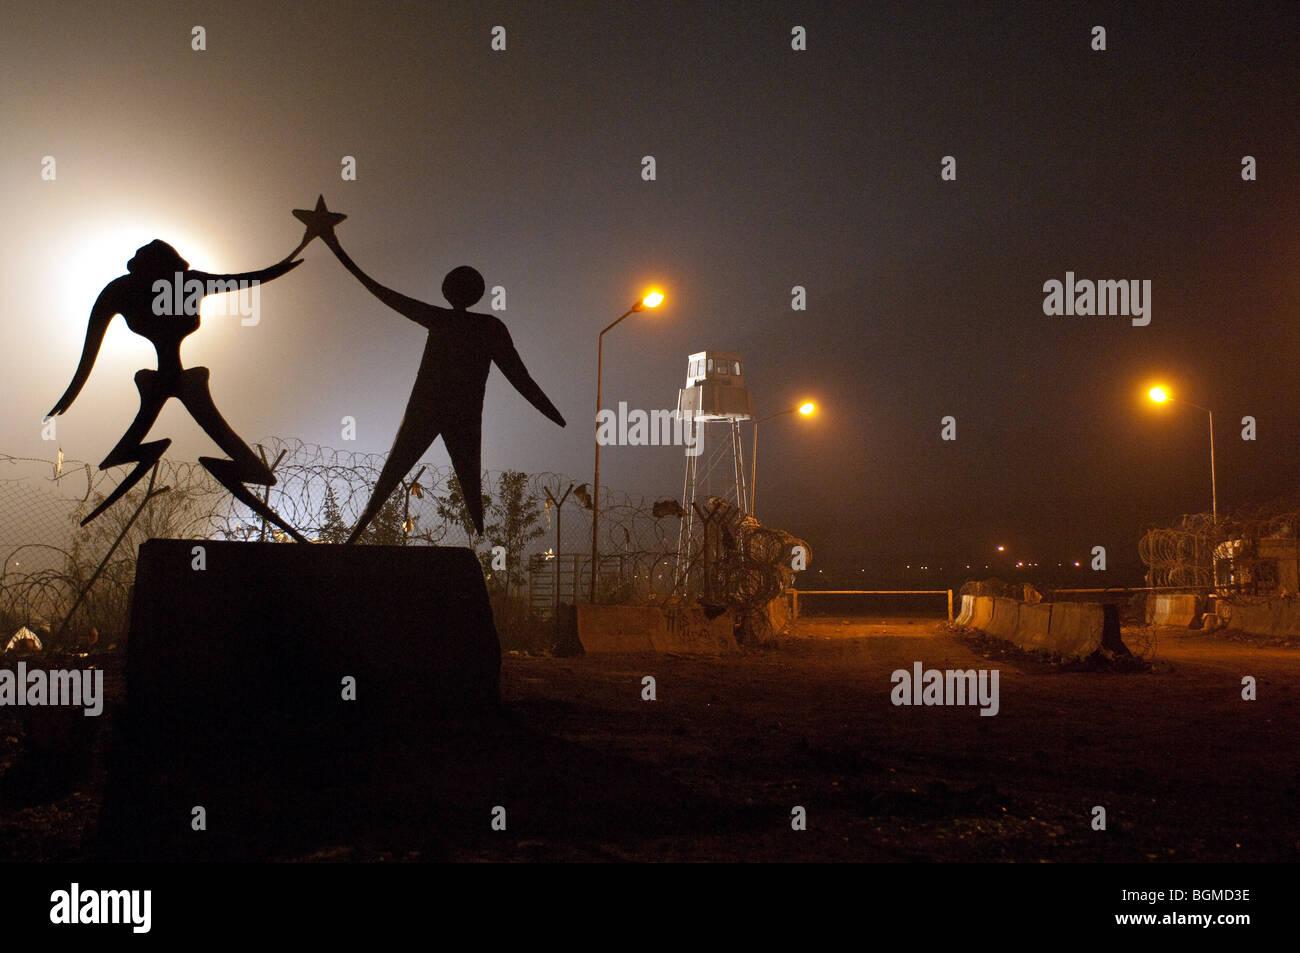 District 9 Year : 2009 Director : Neill Blomkamp - Stock Image